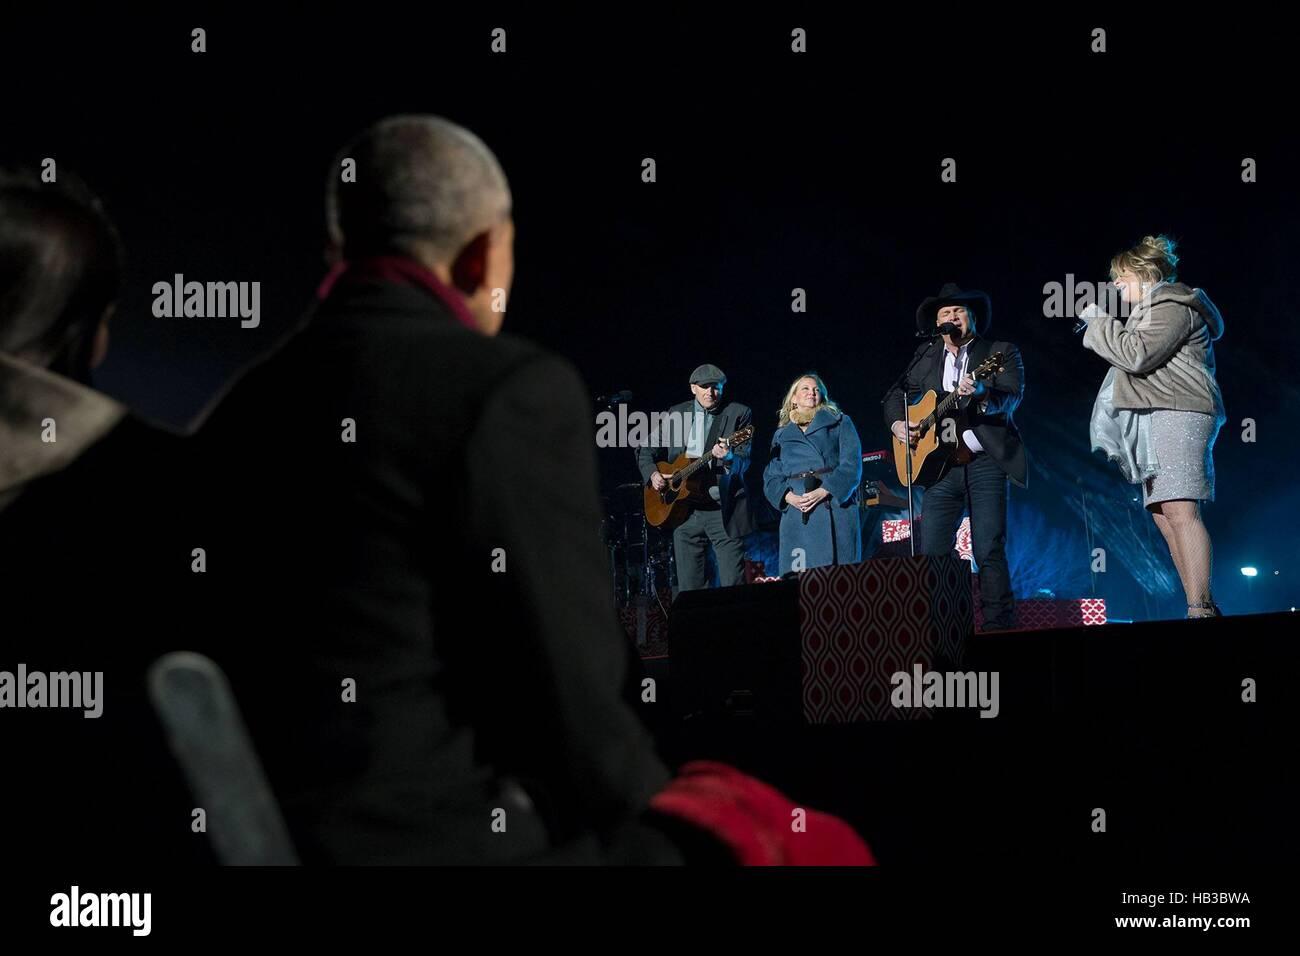 Président américain Barack Obama regarde James Taylor, Kim Taylor, Garth Brooks et Trisha Yearwood effectuer Photo Stock